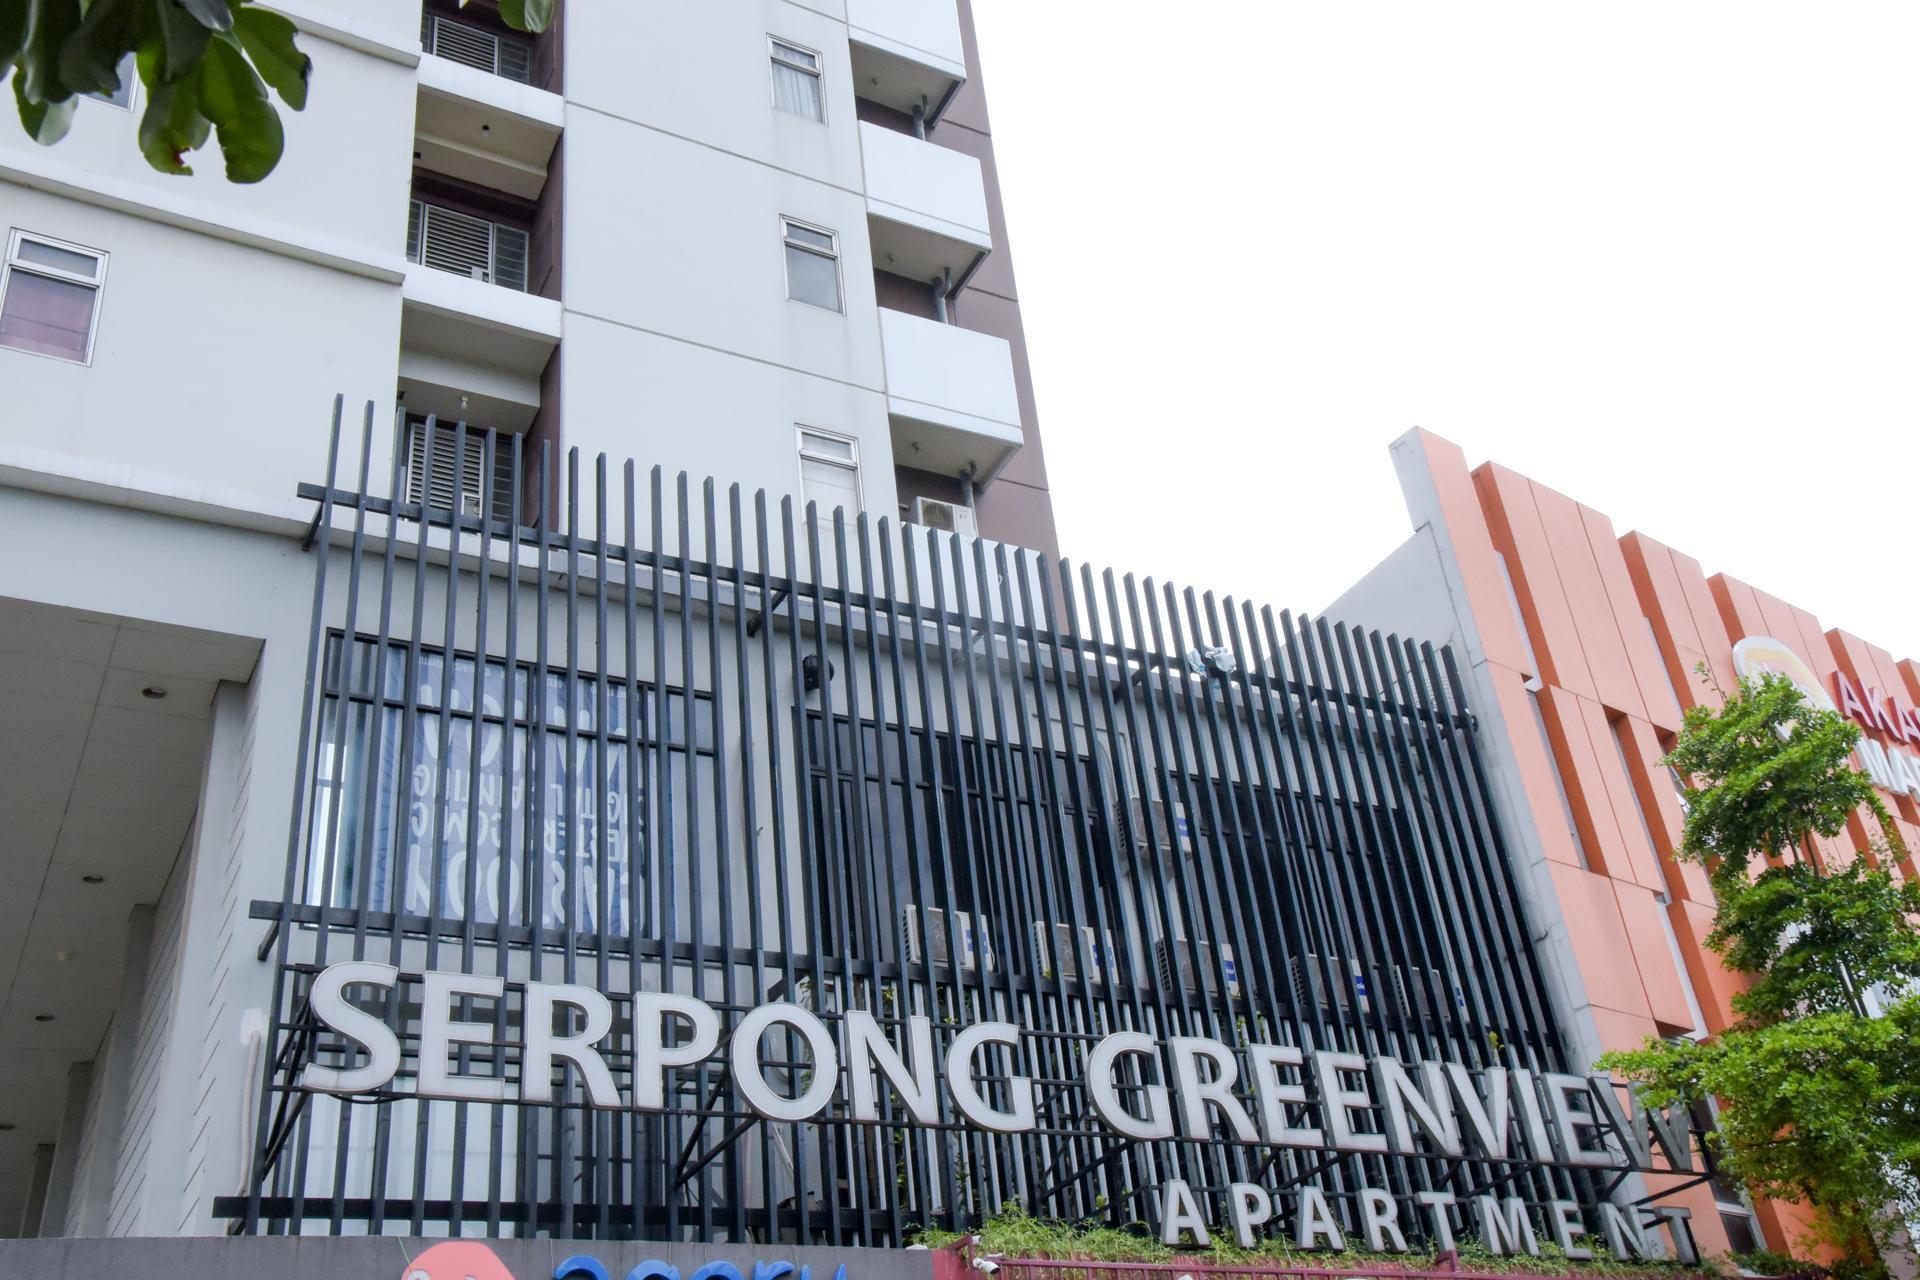 RedDoorz Apartment @ Serpong Green View